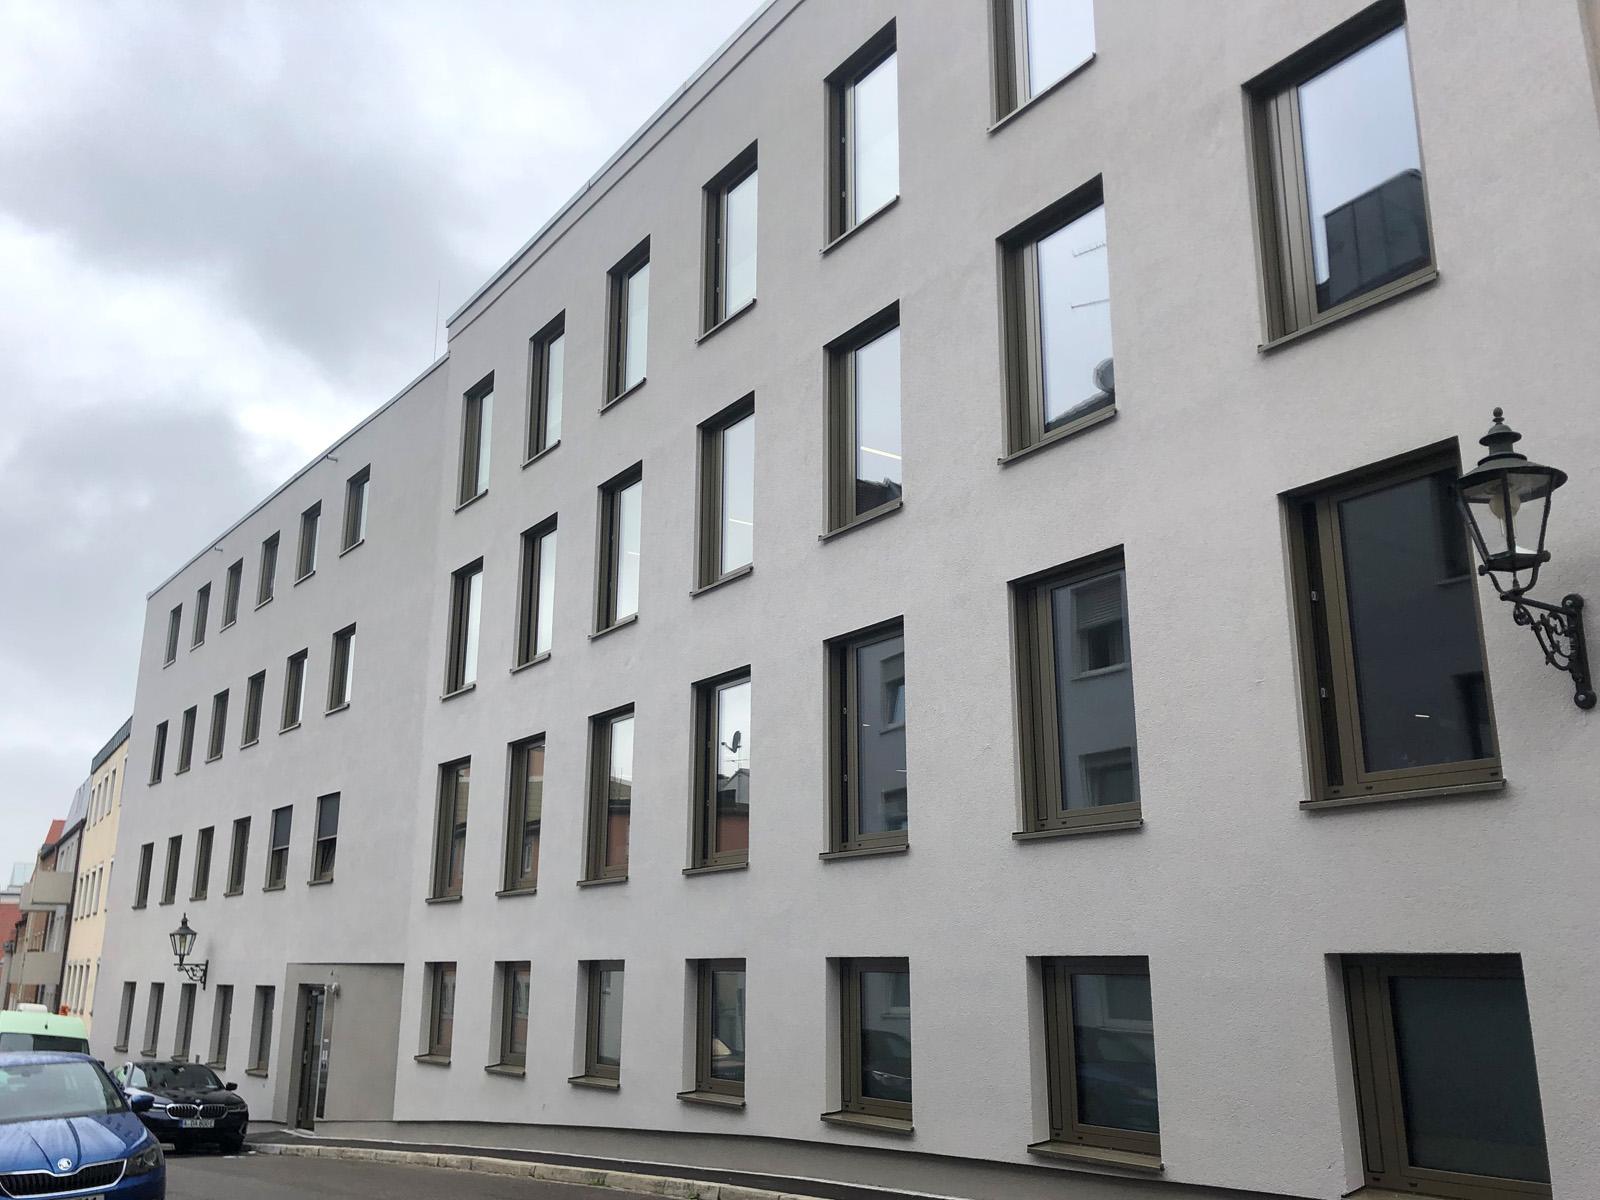 Das neue Bürogebäude am Schmiedberg, vom Mauerberg aus fotografiert (Fotos: Julian Schmidt / pba)